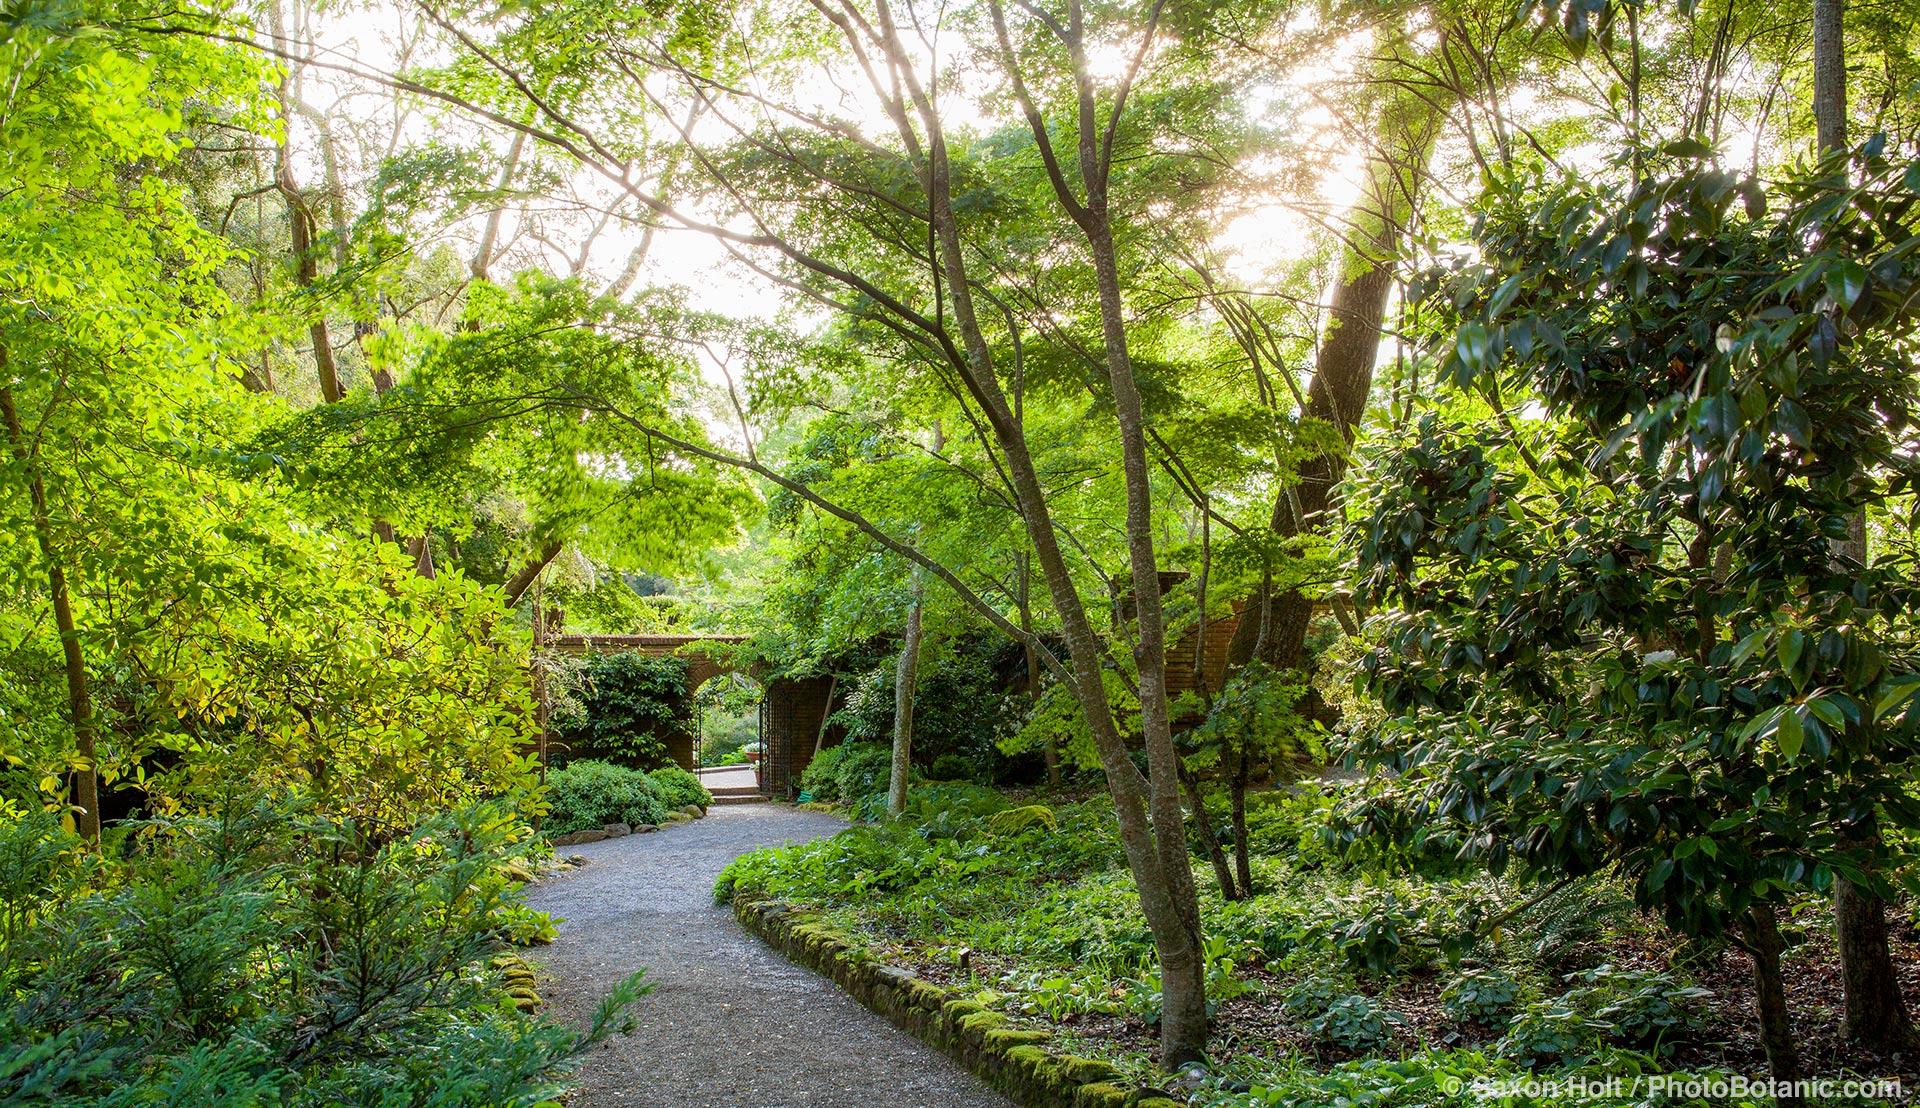 Gravel path in woodland garden to open door into walled garden in morning light at Filoli